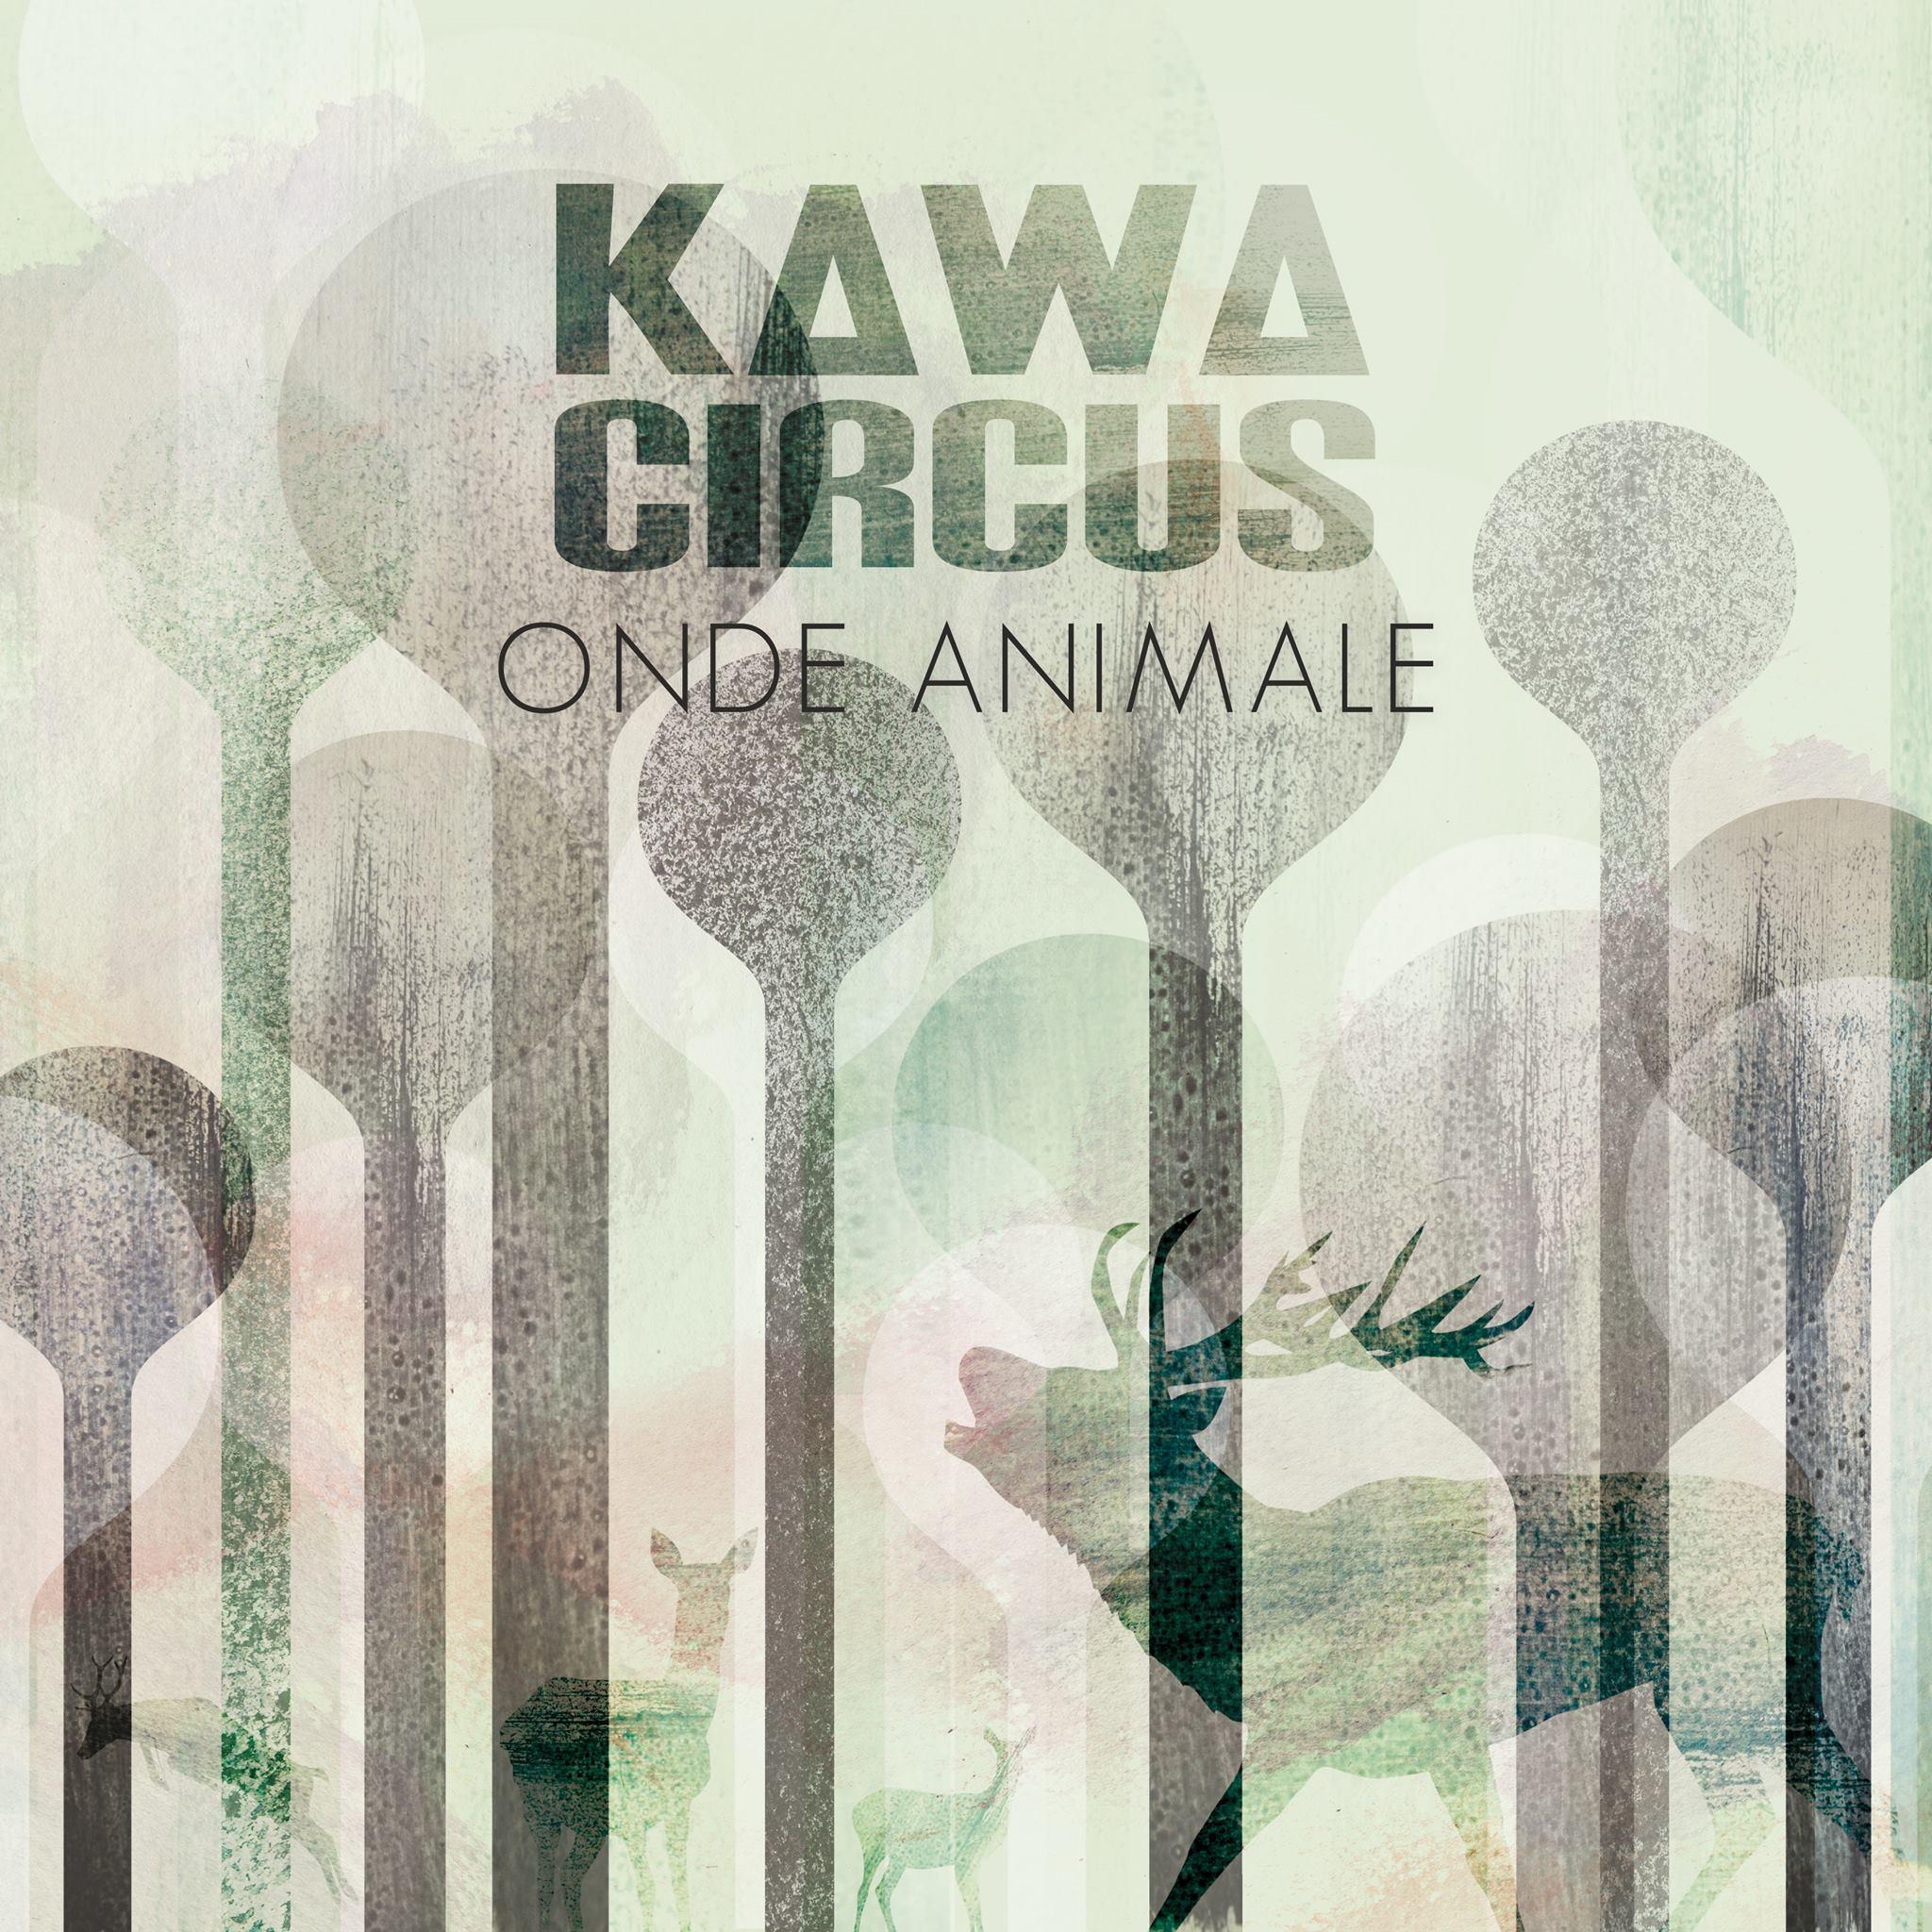 Kawa Circus